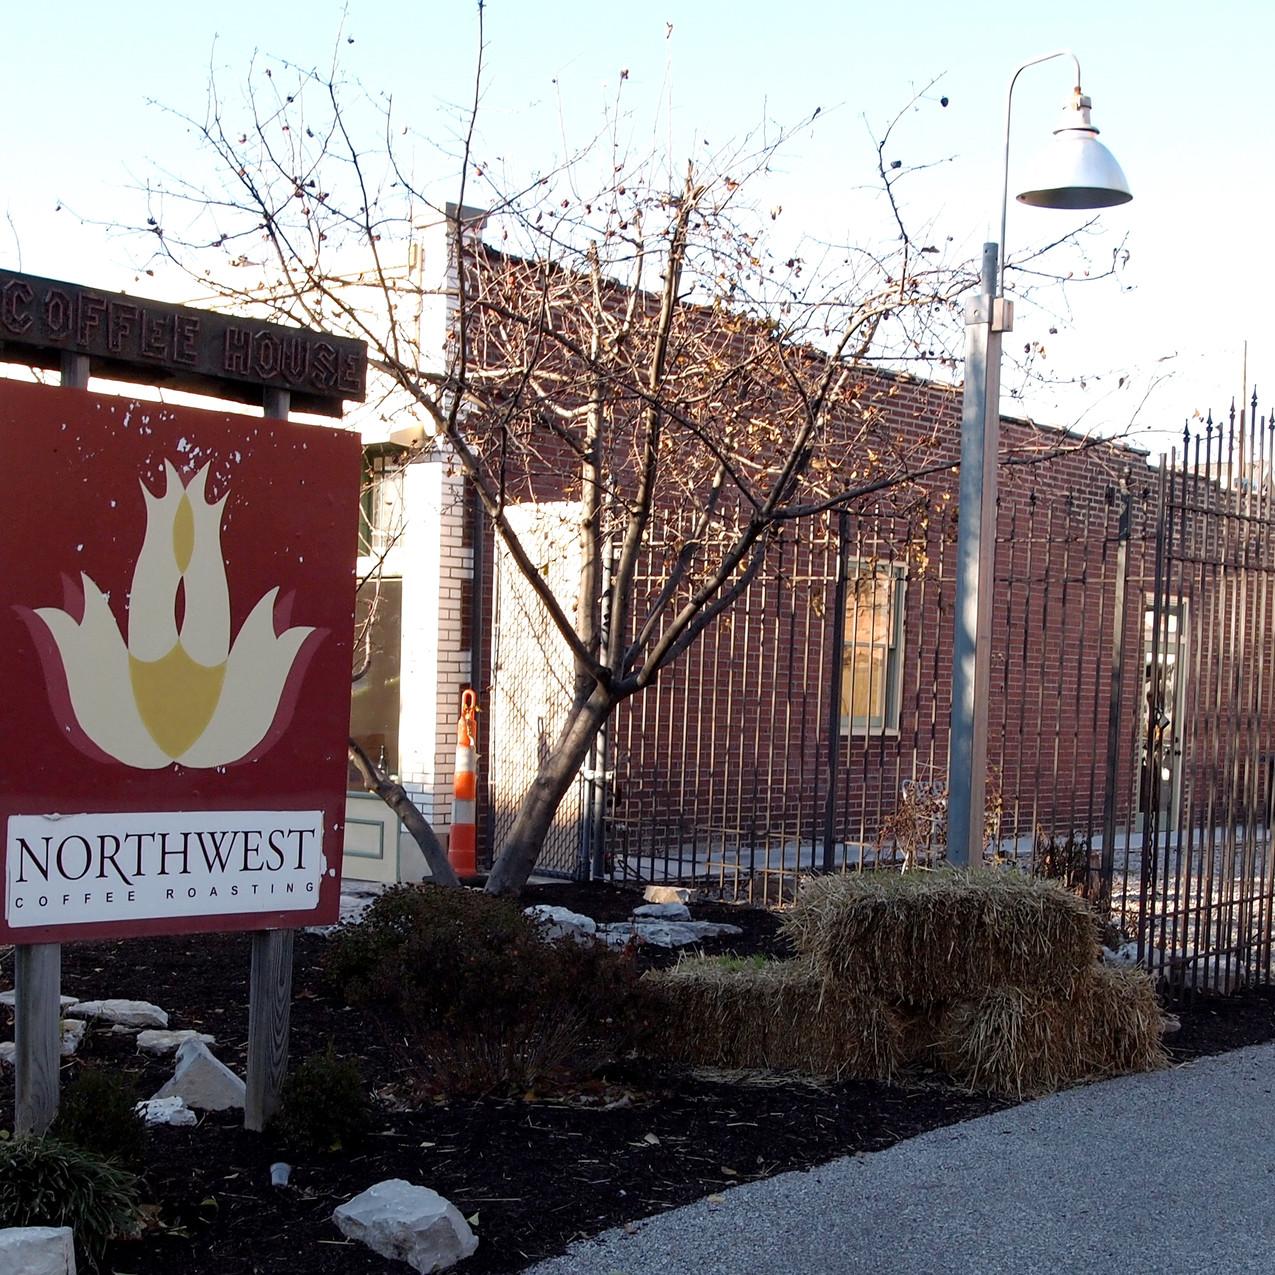 Northwest Coffee - Boyle & Laclede 63108